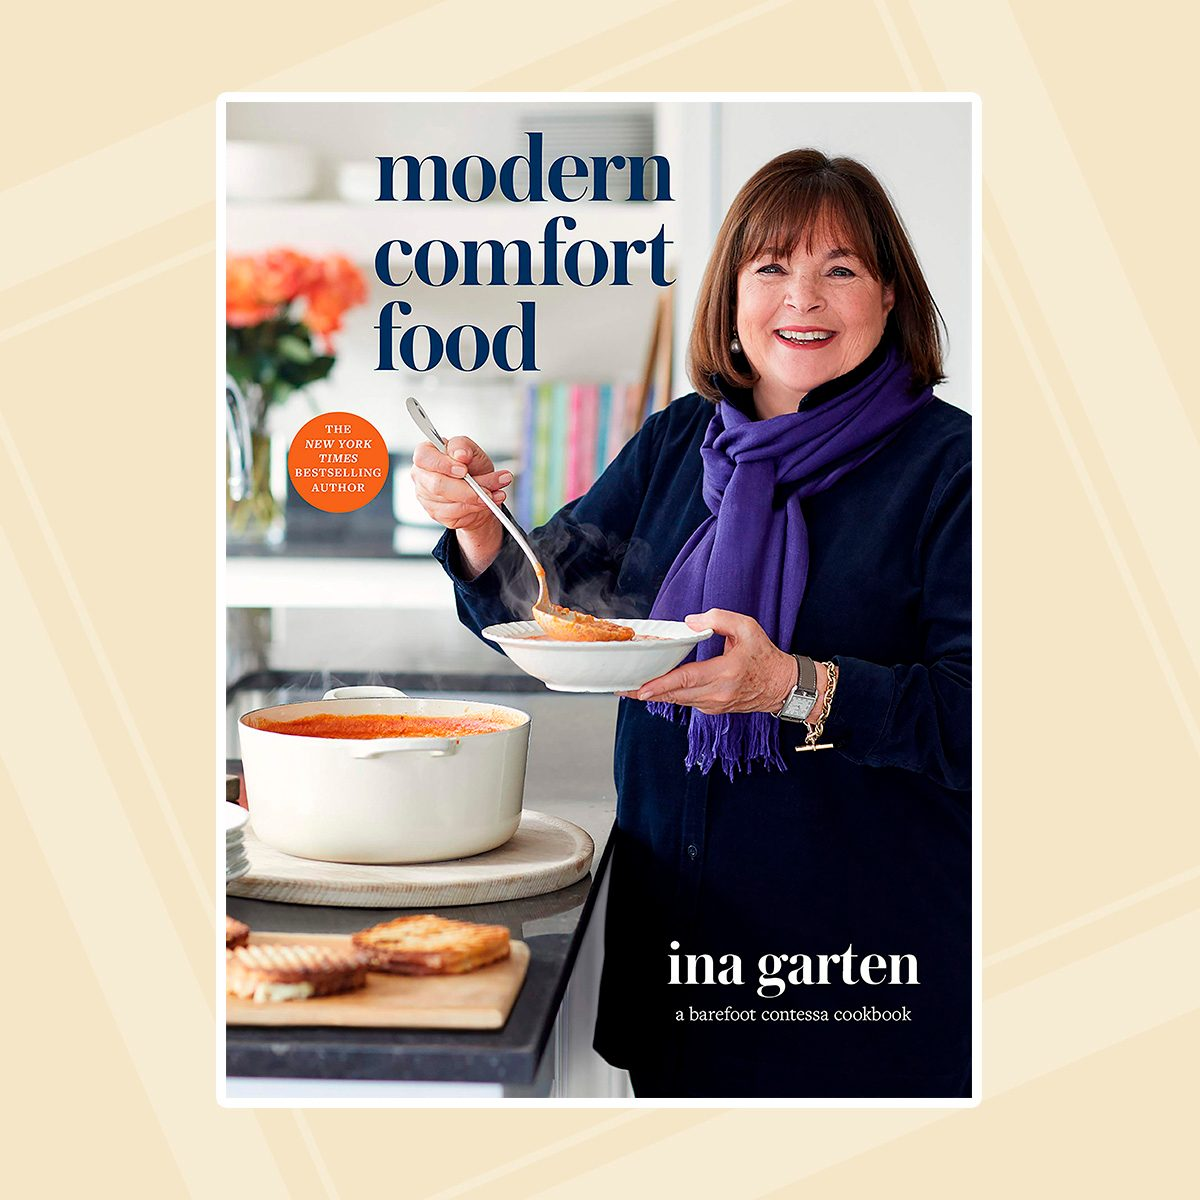 Modern Comfort Food: A Barefoot Contessa Cookbook Hardcover – Illustrated, October 6, 2020